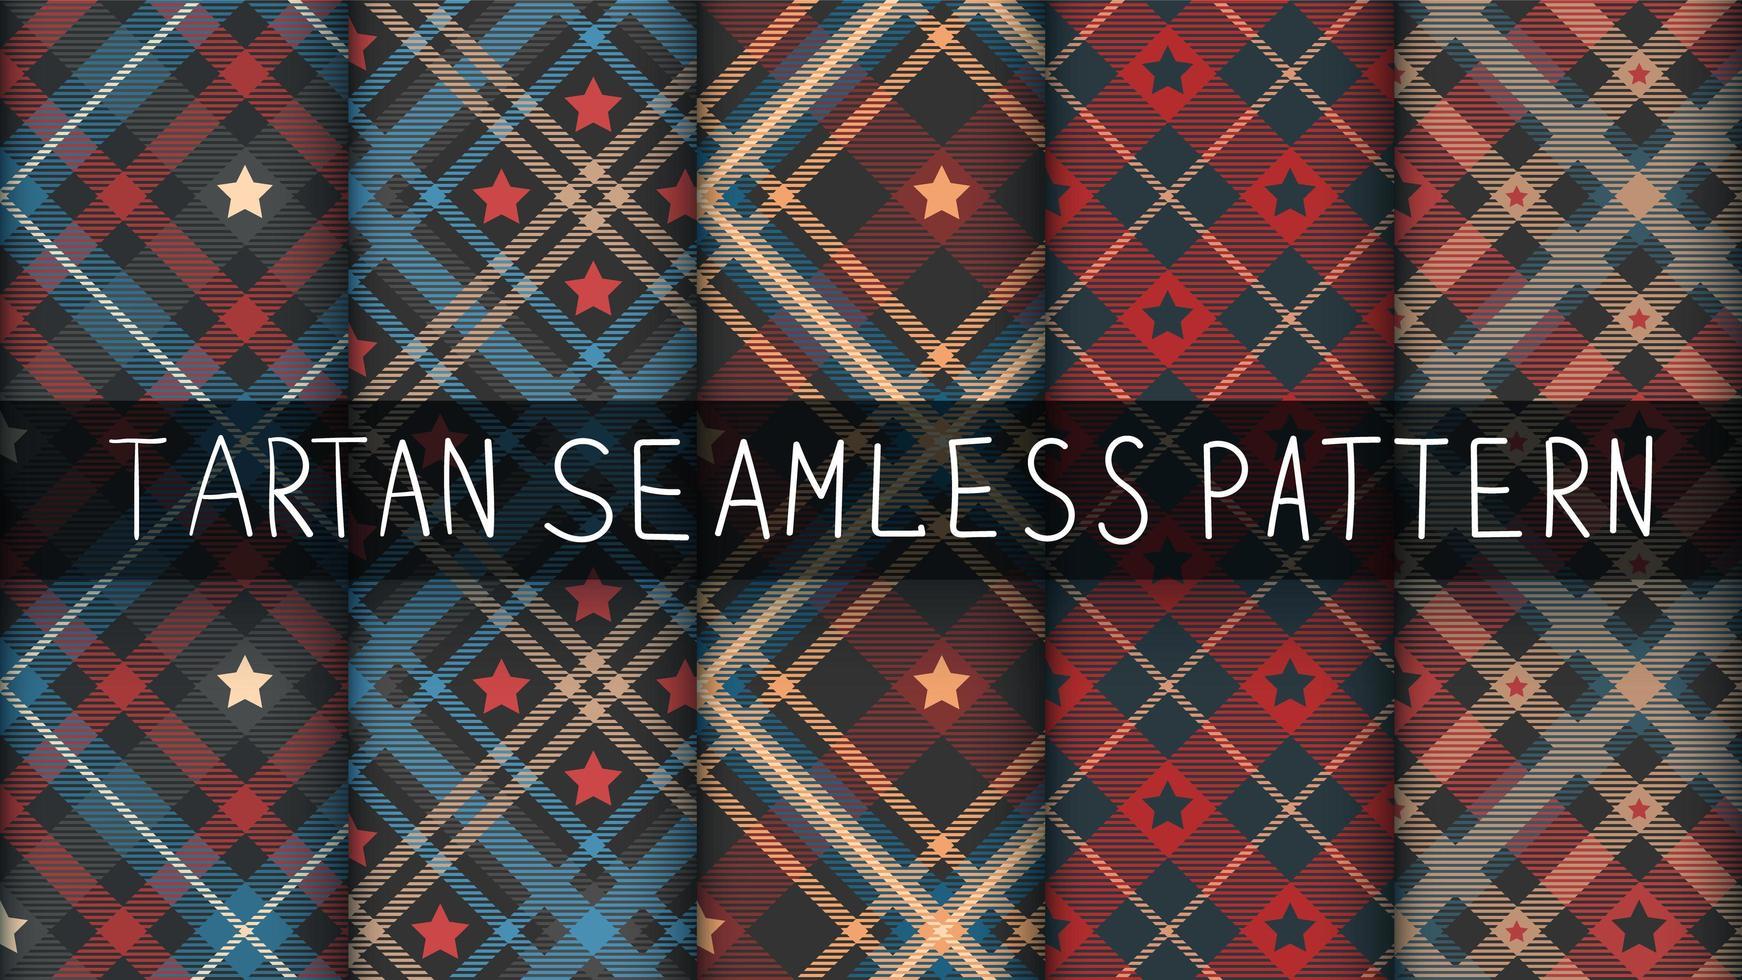 conjunto de fundo tartan star seamless pattern vetor